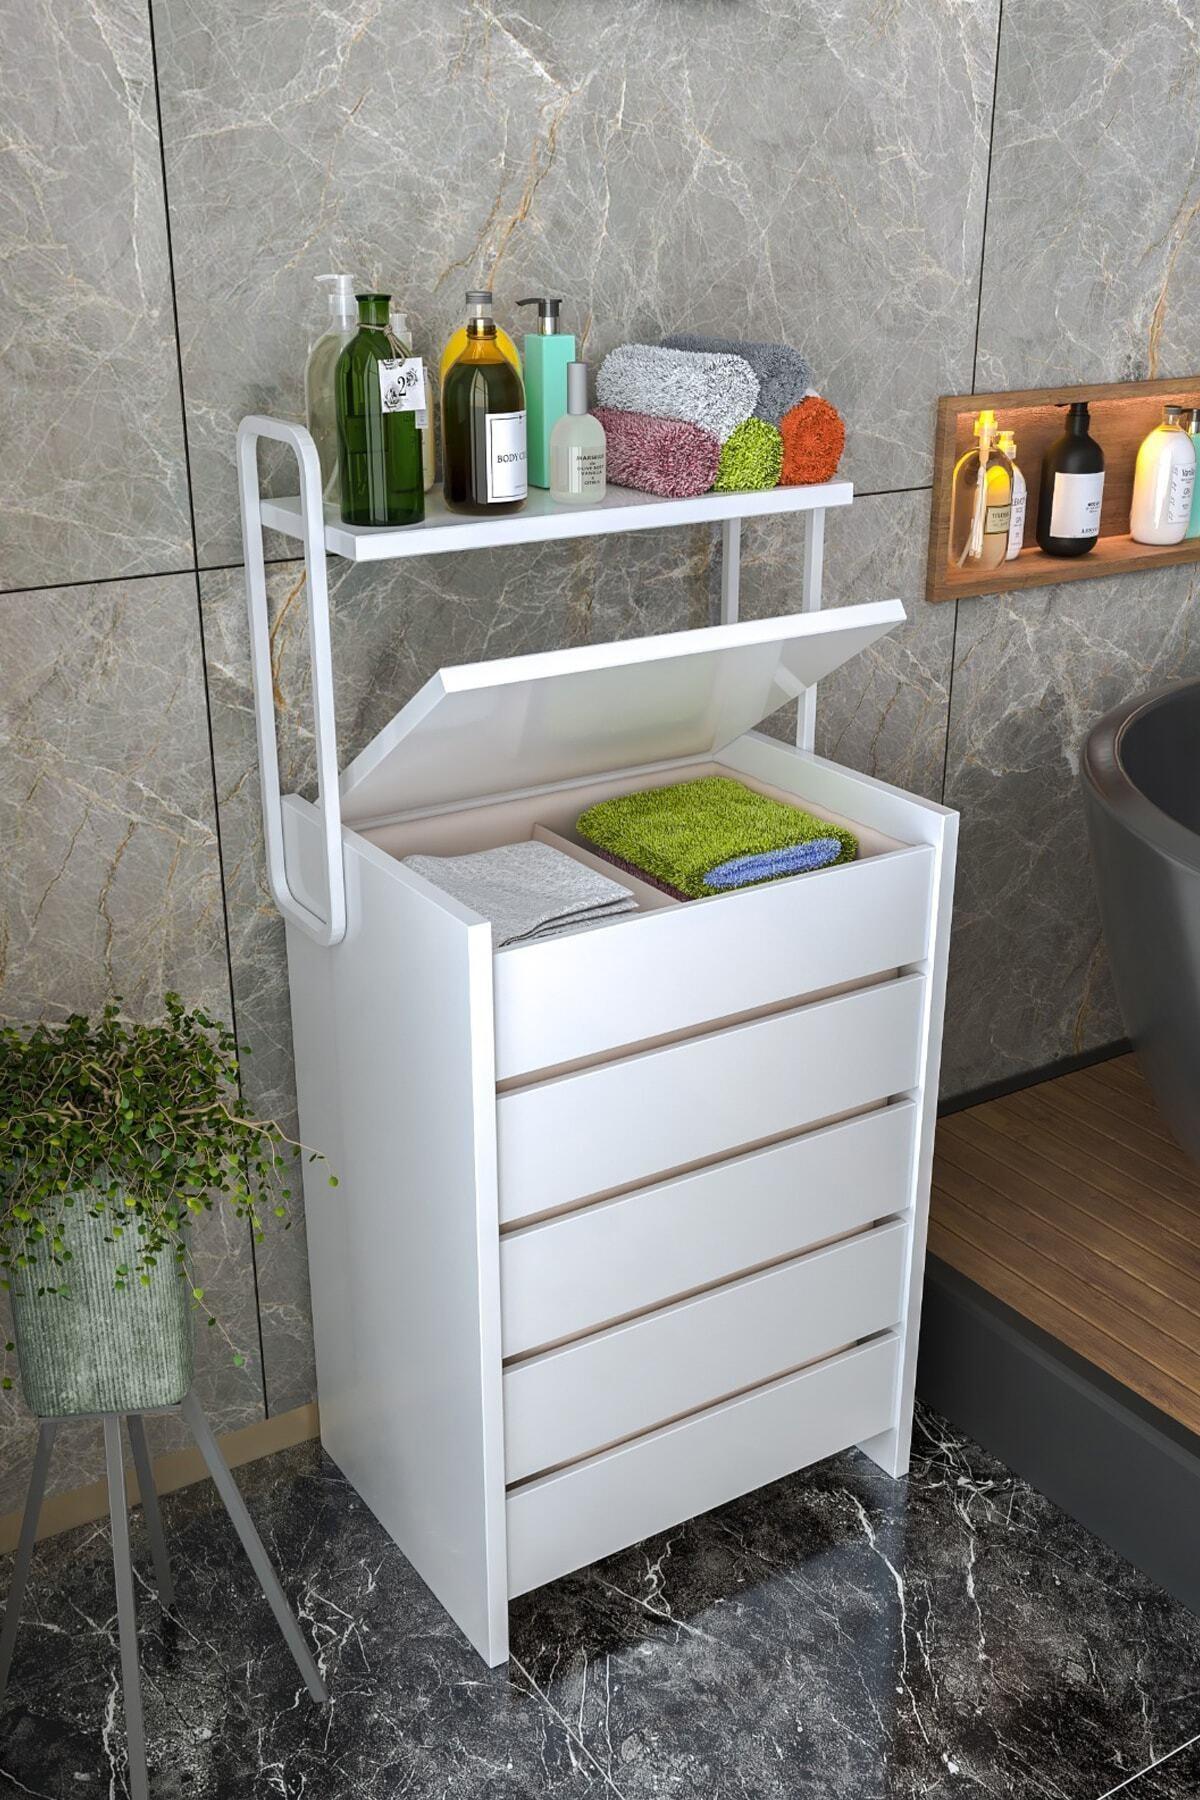 Beyaz Ahşap Banyo Kirli Çamaşır Sepeti